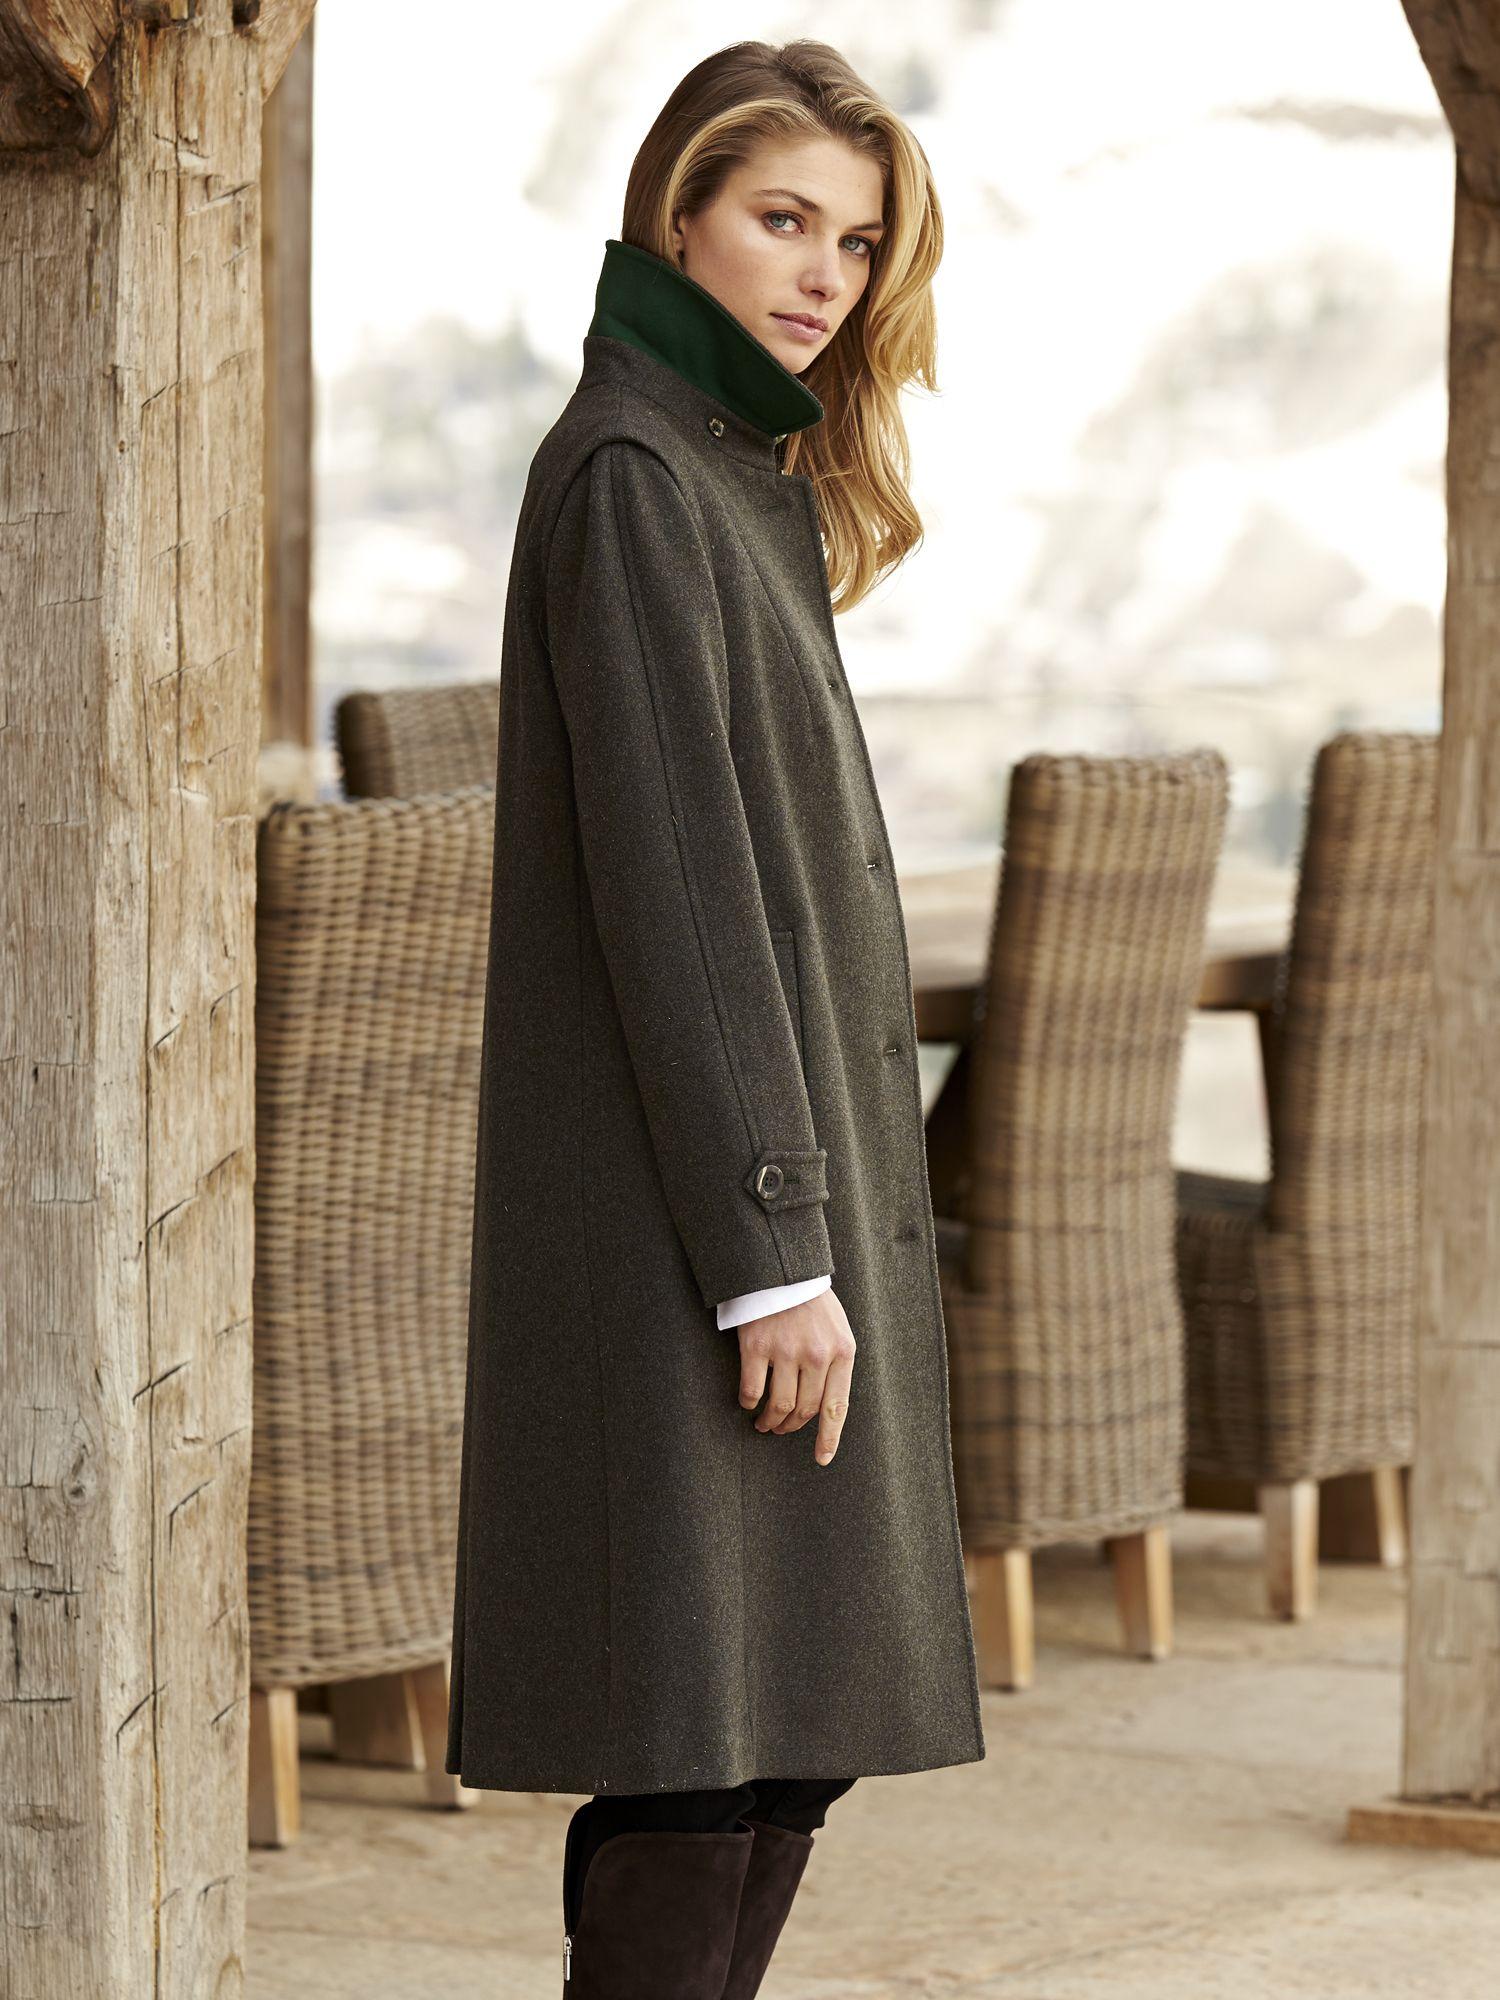 dd95f3ea8 Huberta Loden Coat | coats in 2019 | Outerwear women, Coat, Fashion